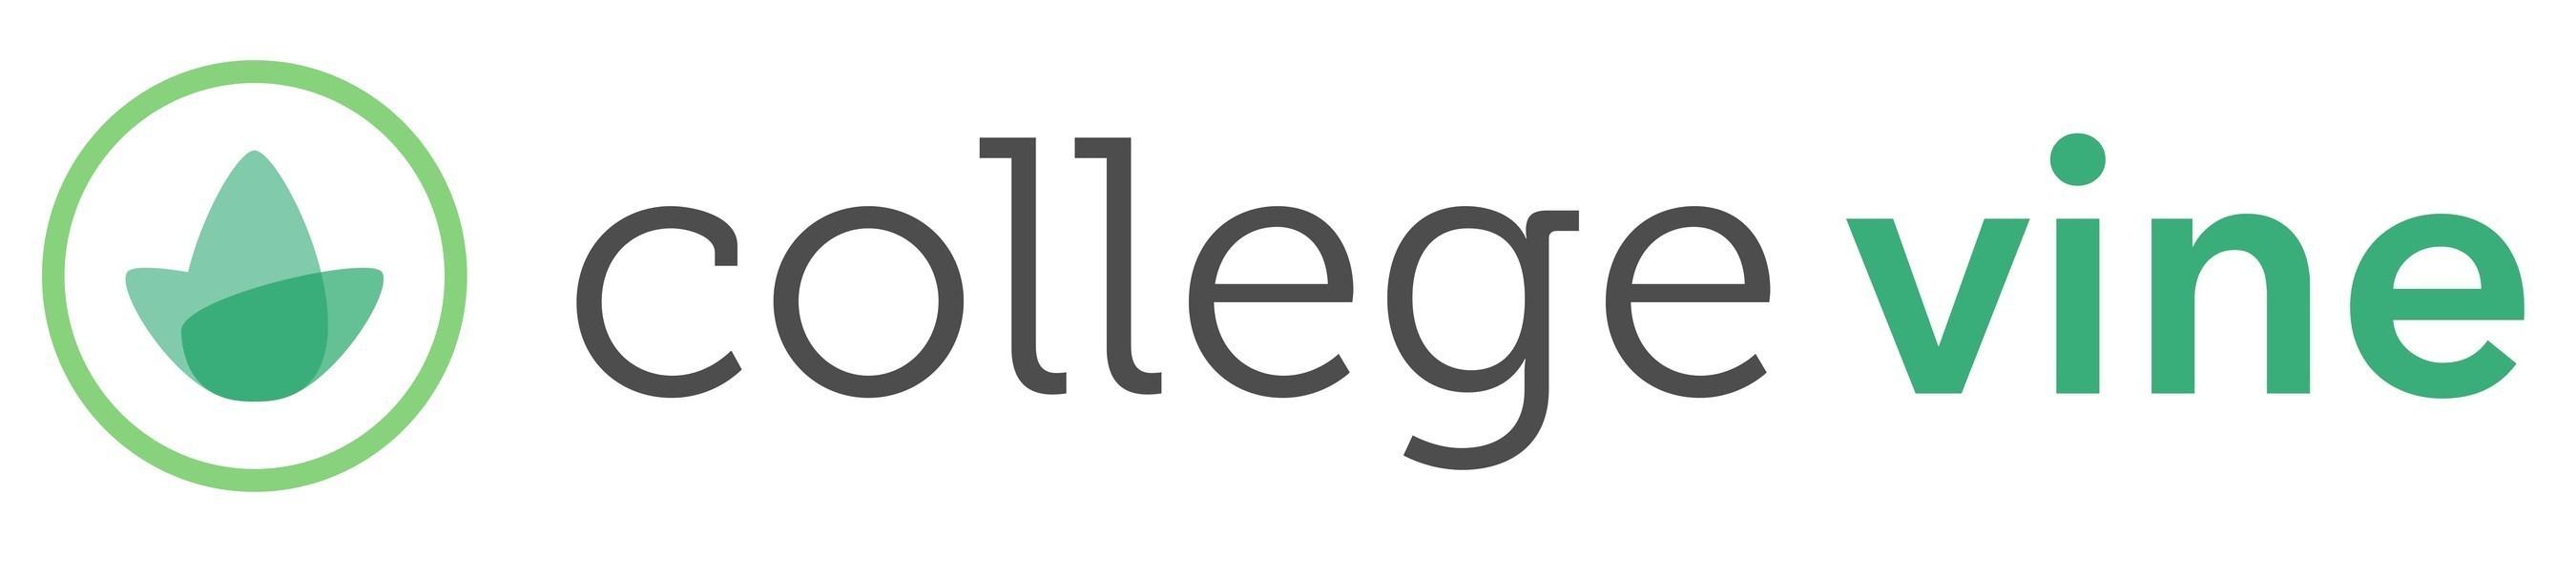 CollegeVine-Logo-Large Logo